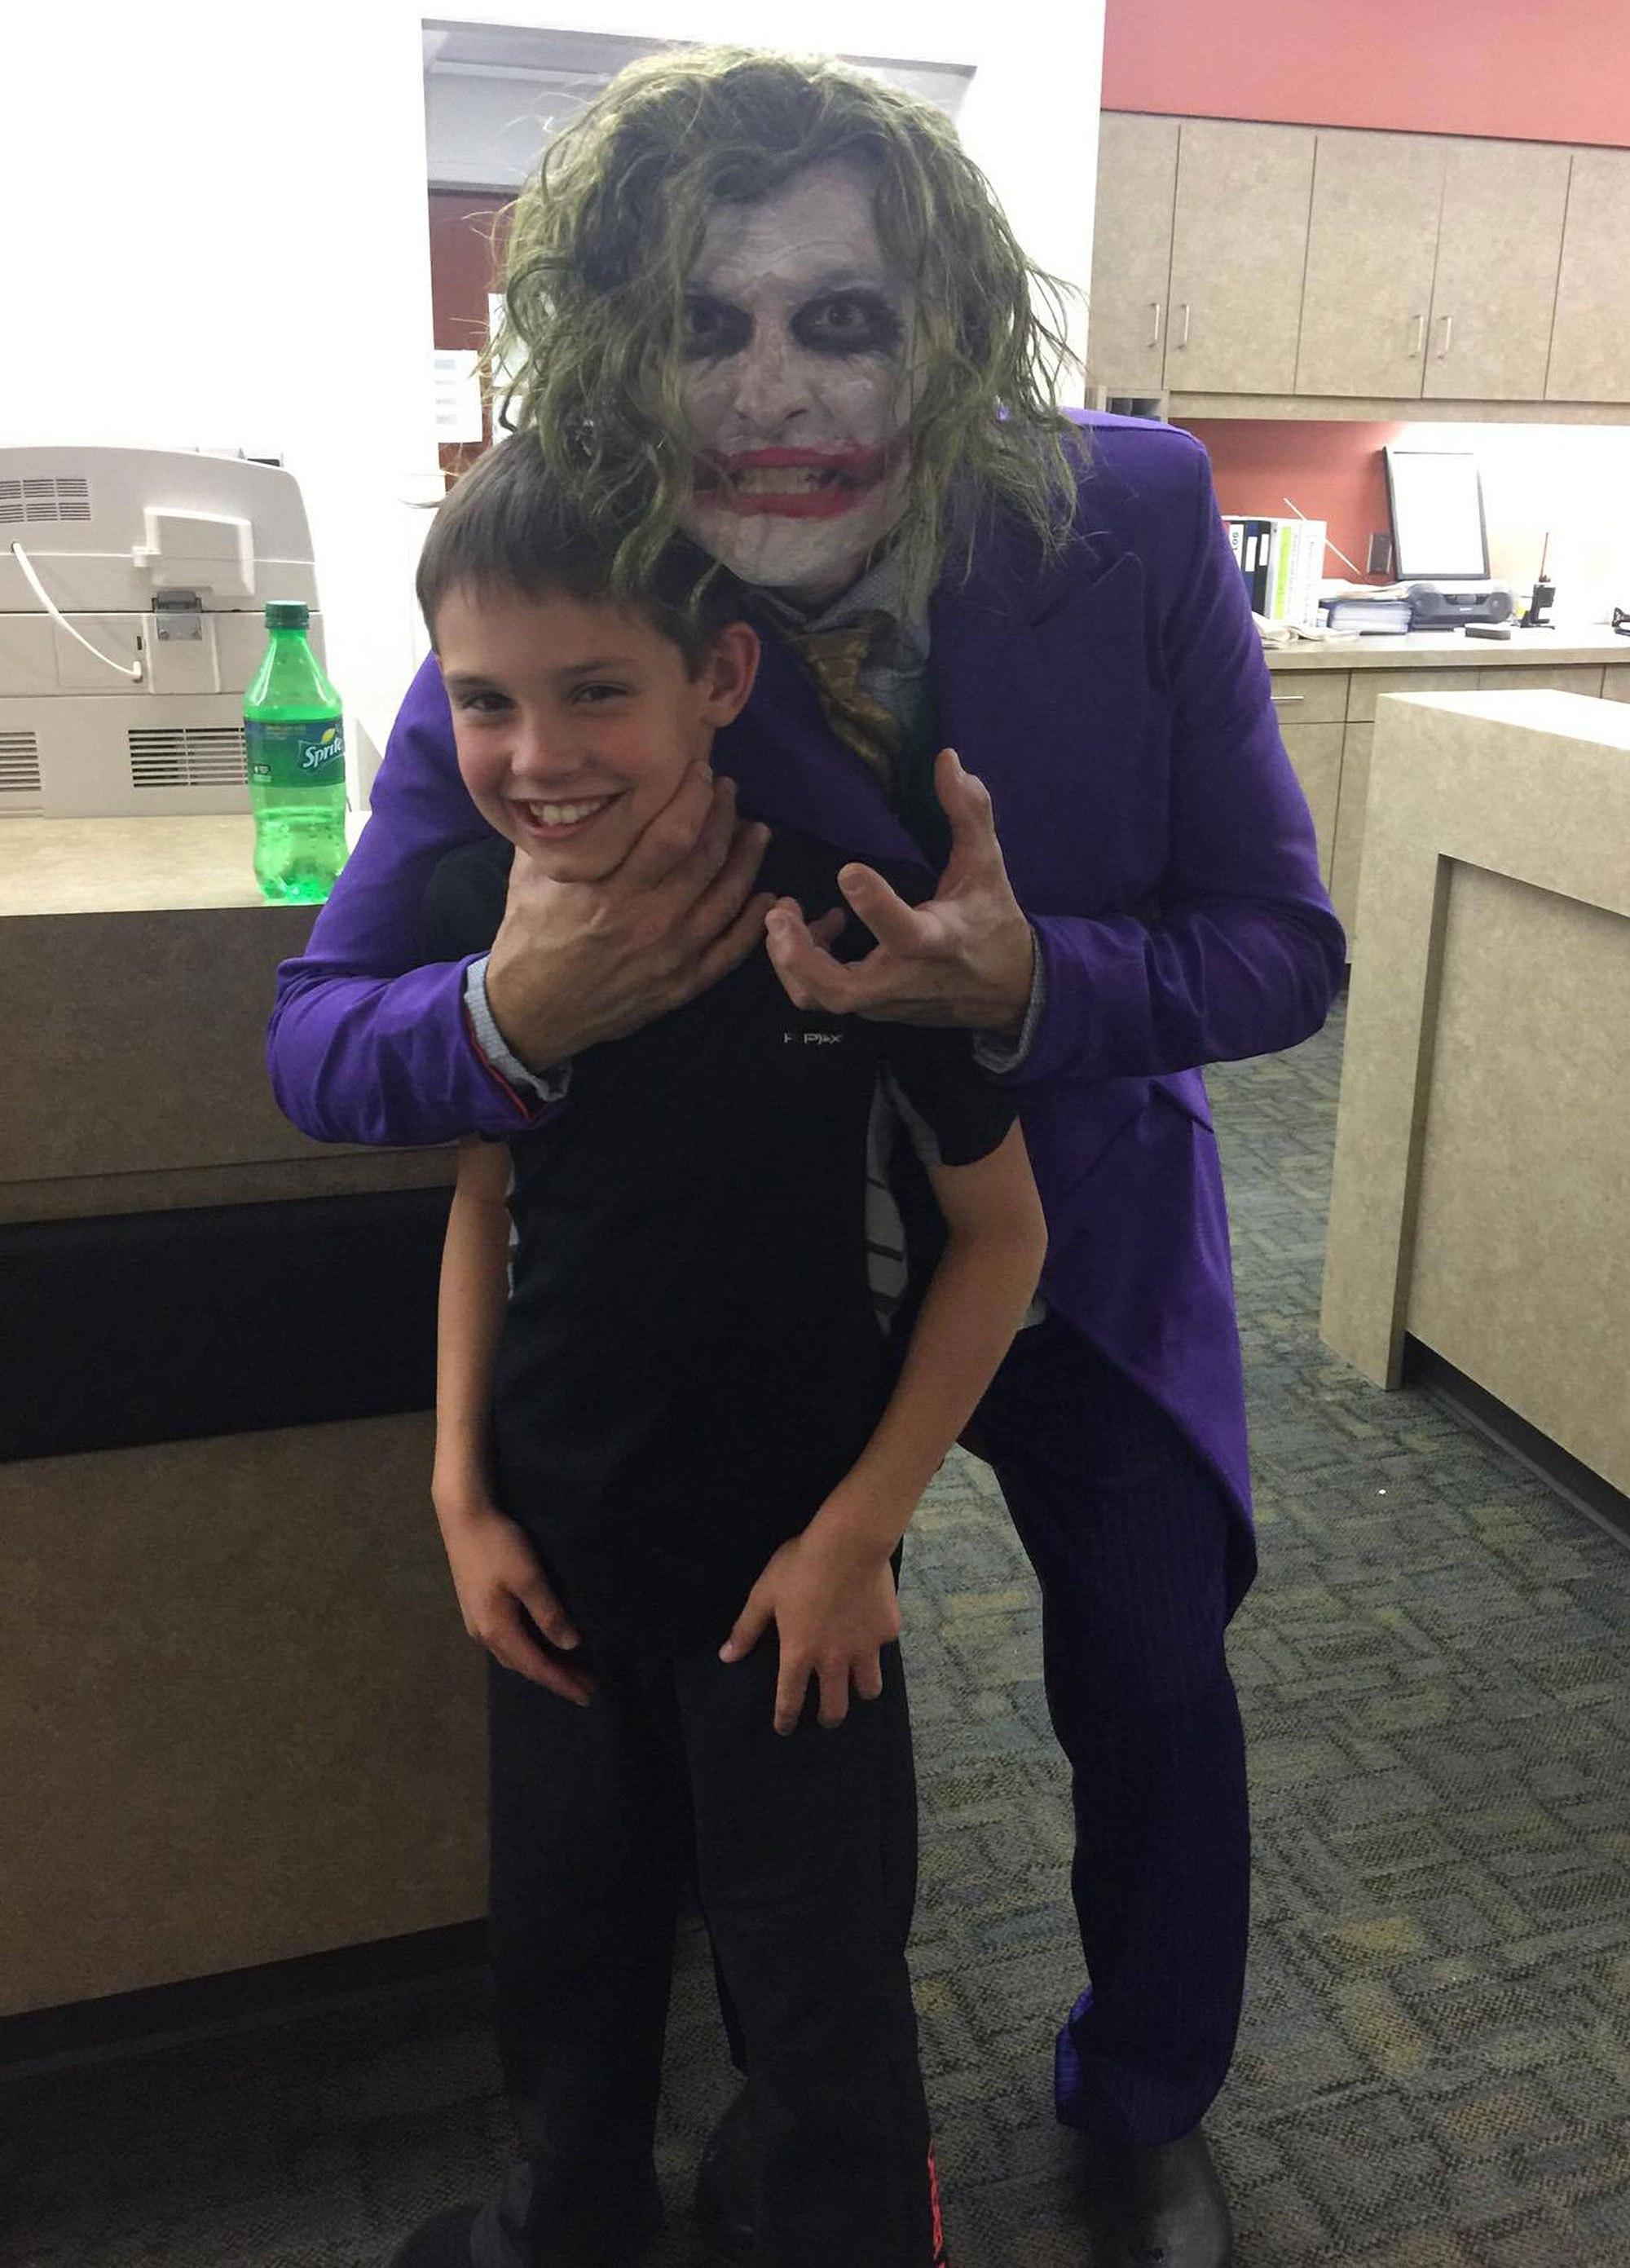 Dr. Locus dressed as The Joker